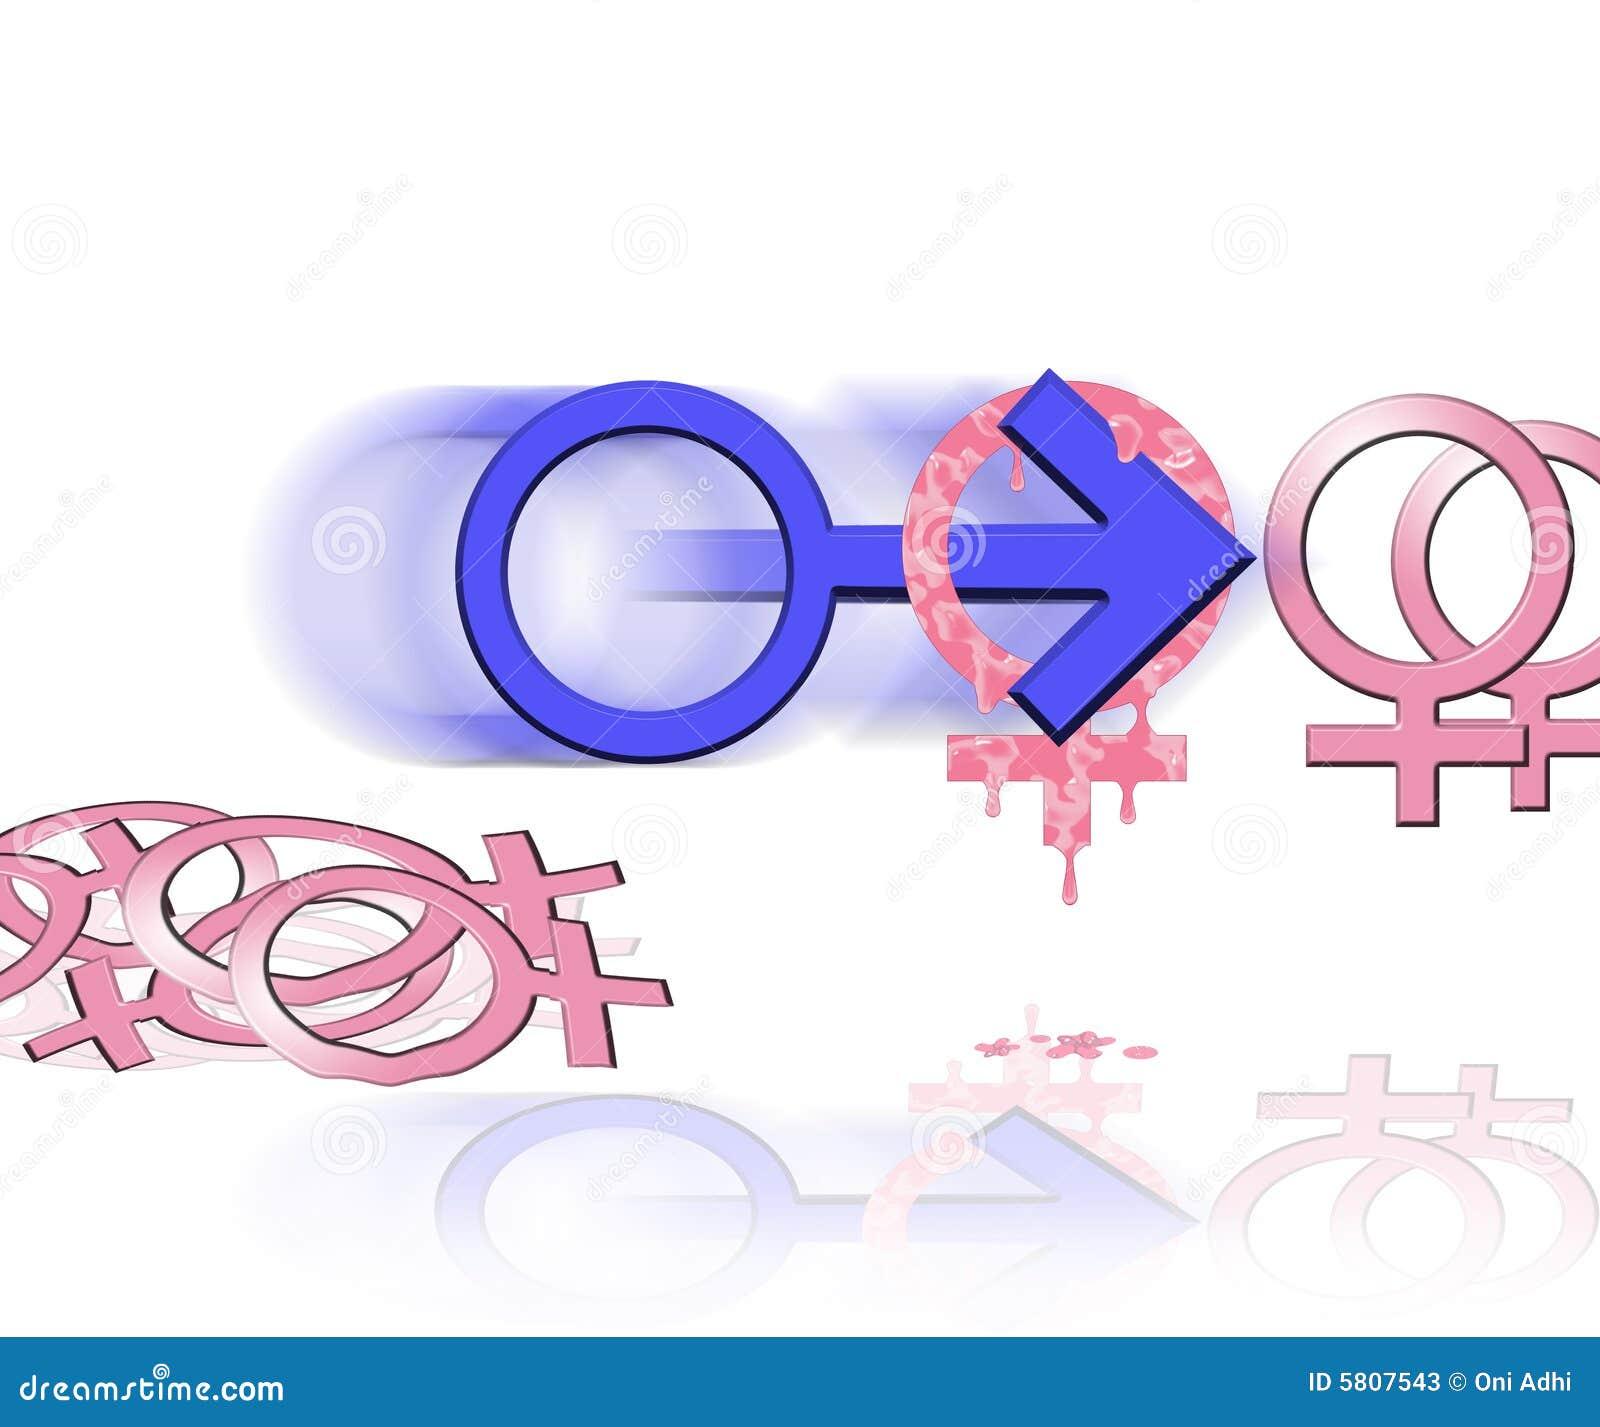 Sex party symbol stock illustration illustration of girls 5807543 sex party symbol buycottarizona